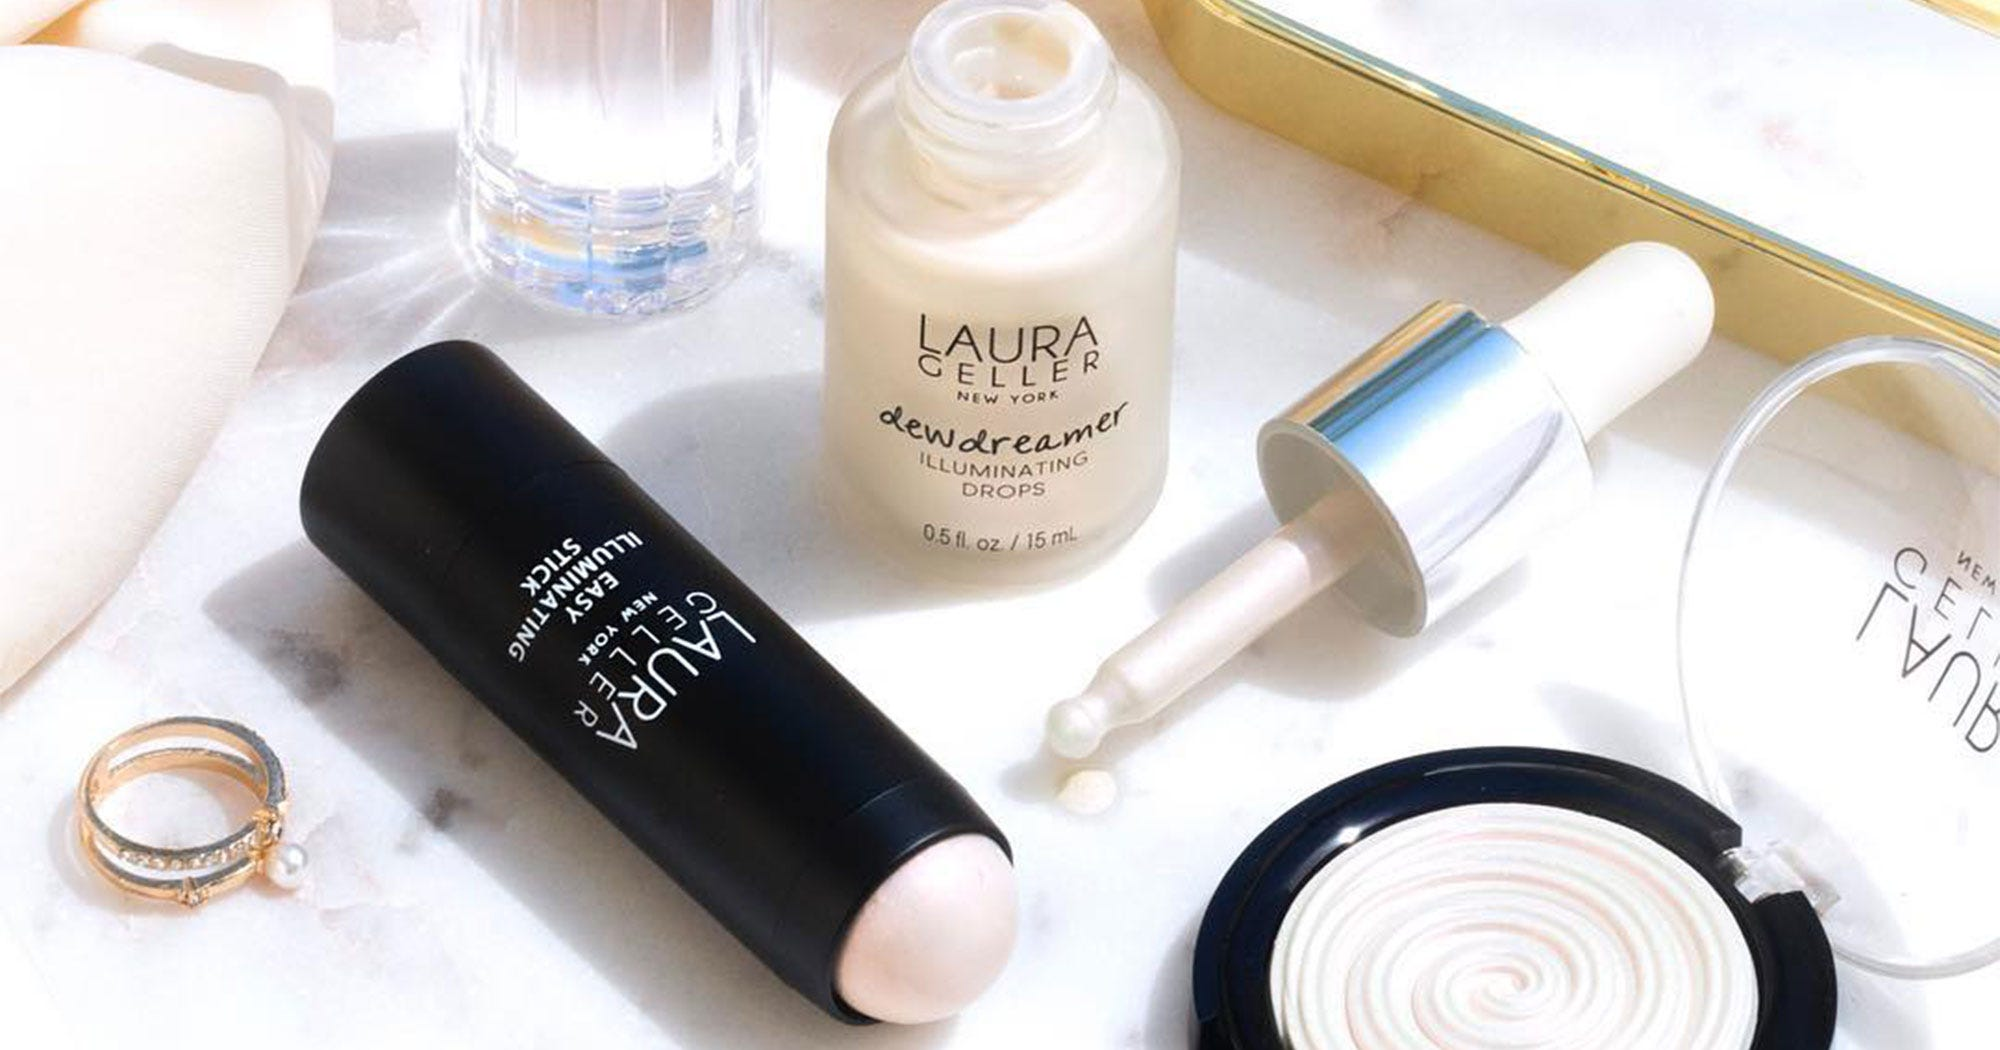 b90af2d7b39 Best Amazon Beauty Deals   Makeup To Buy In April 2019